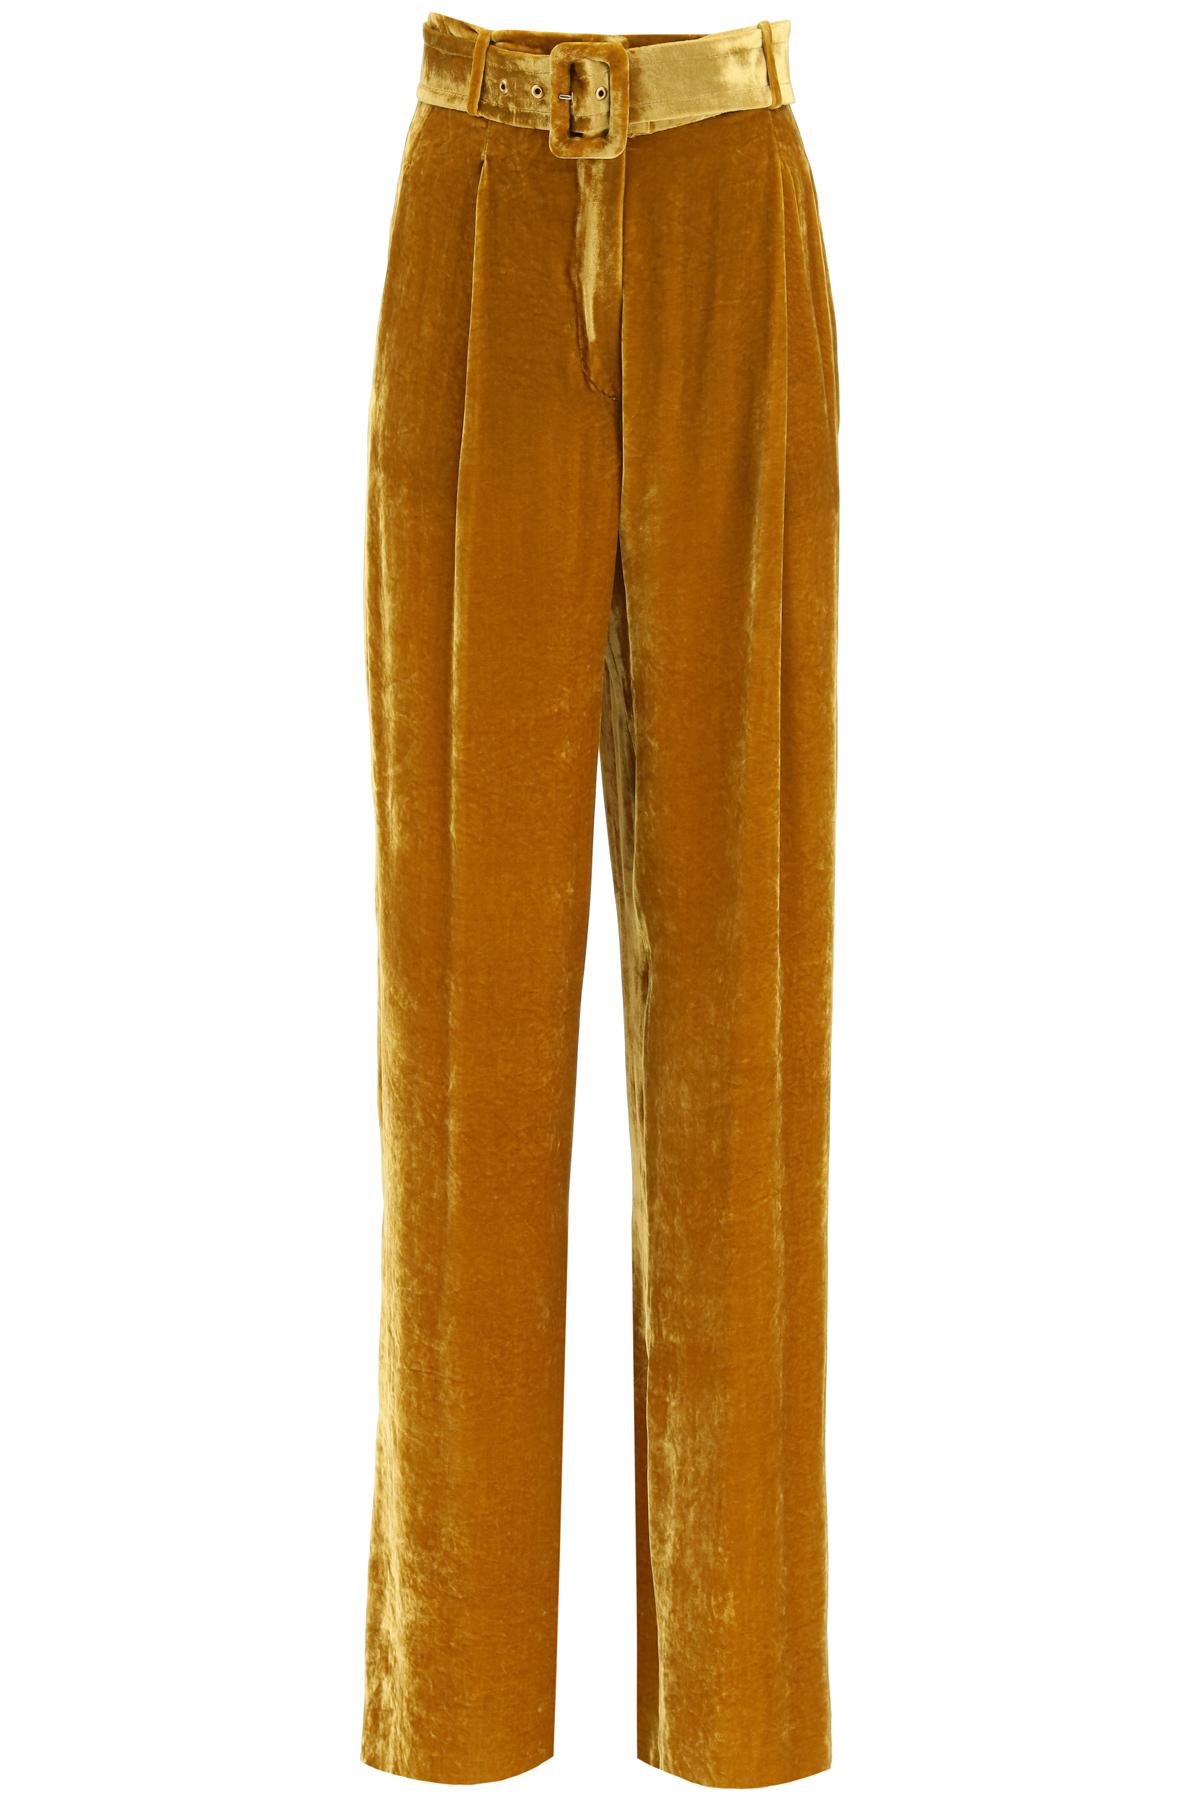 Sportmax pantalone uta in velluto liscio